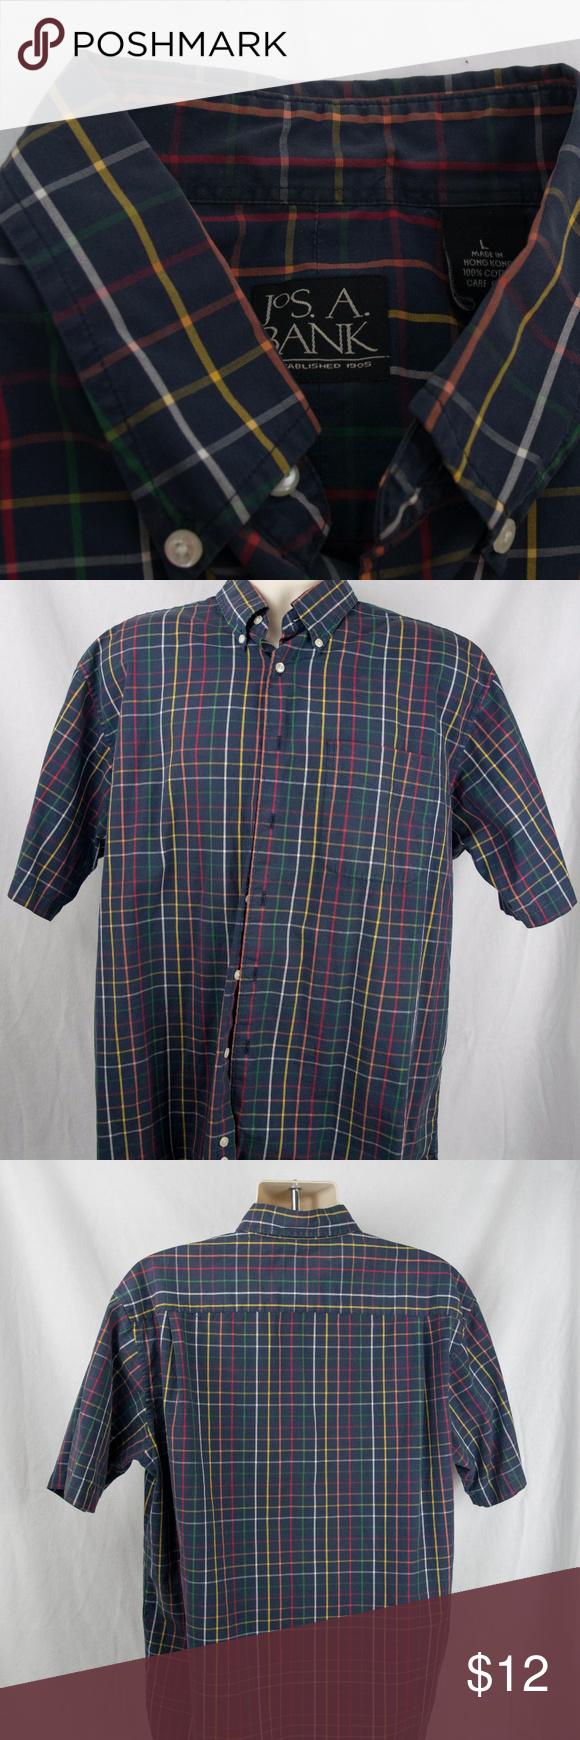 Jos. A. Bank shirt Good condition Jos. A. Bank Shirts